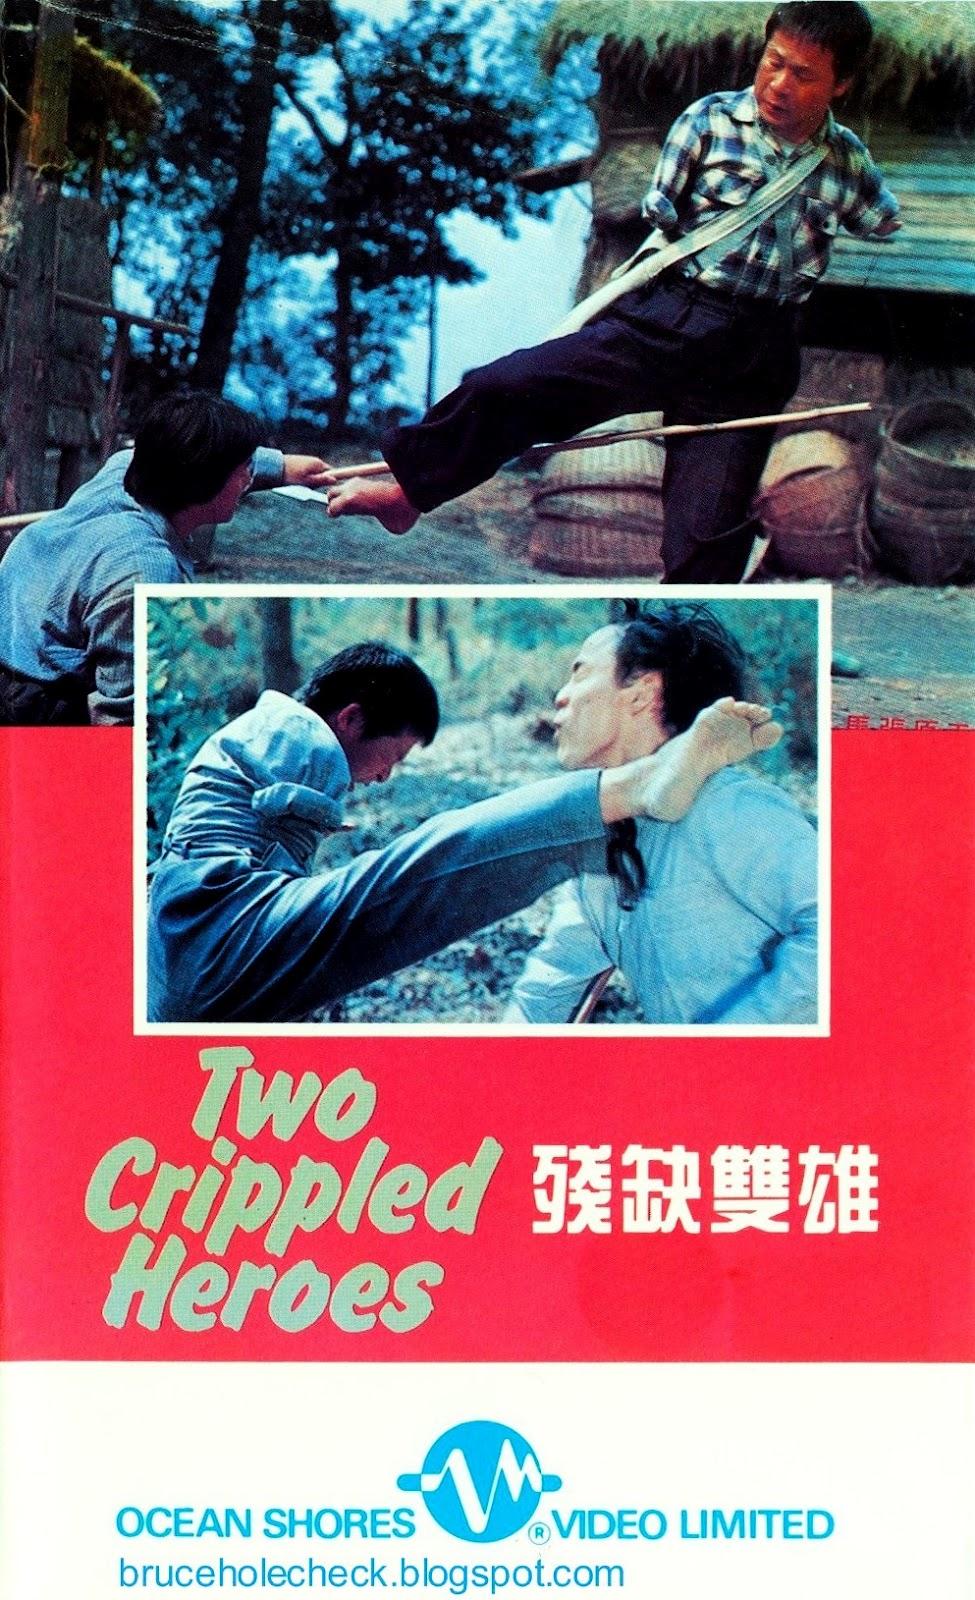 Can que shuang xiong ((1980))